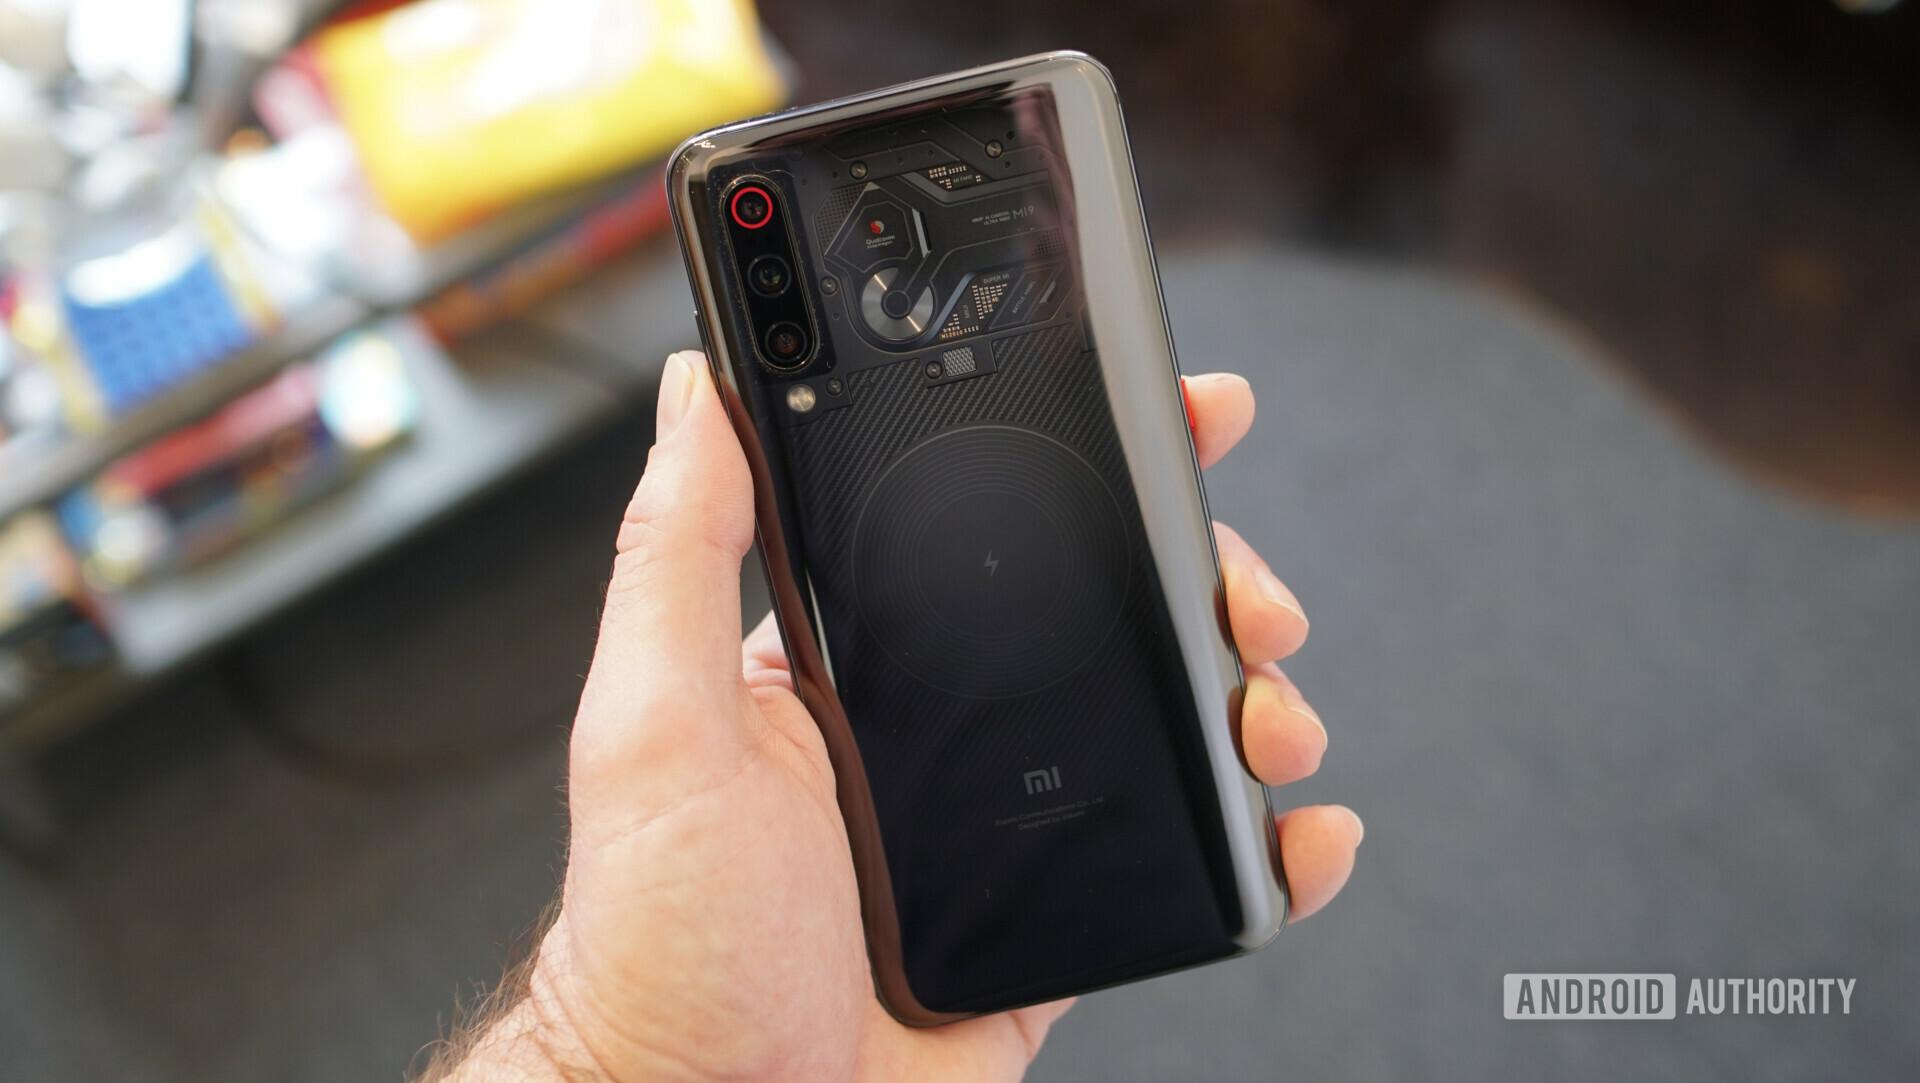 Xiaomi Mi 9 transparent edition back panel